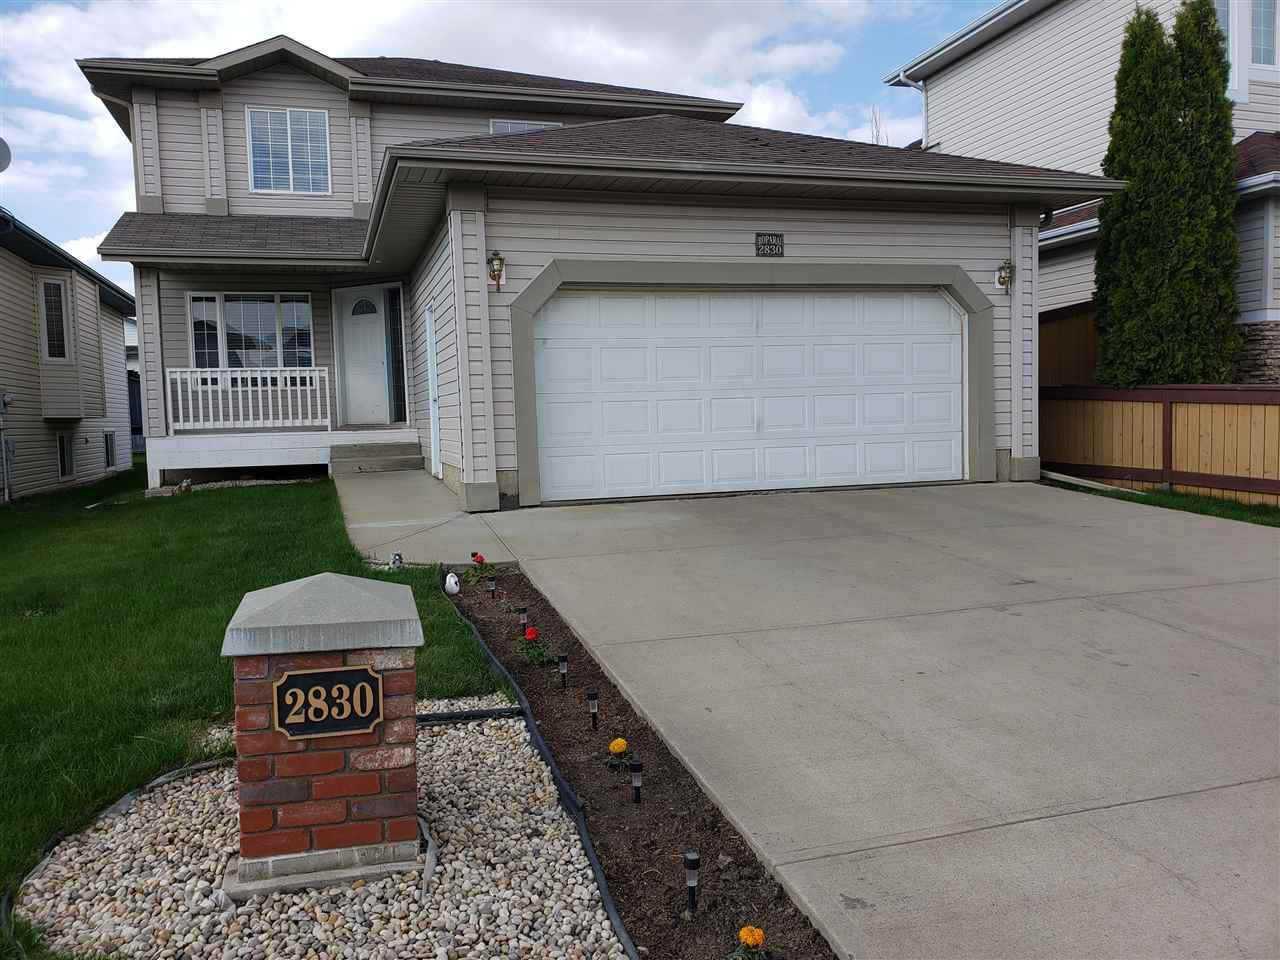 Main Photo: 2830 41 Avenue in Edmonton: Zone 30 House for sale : MLS®# E4199050